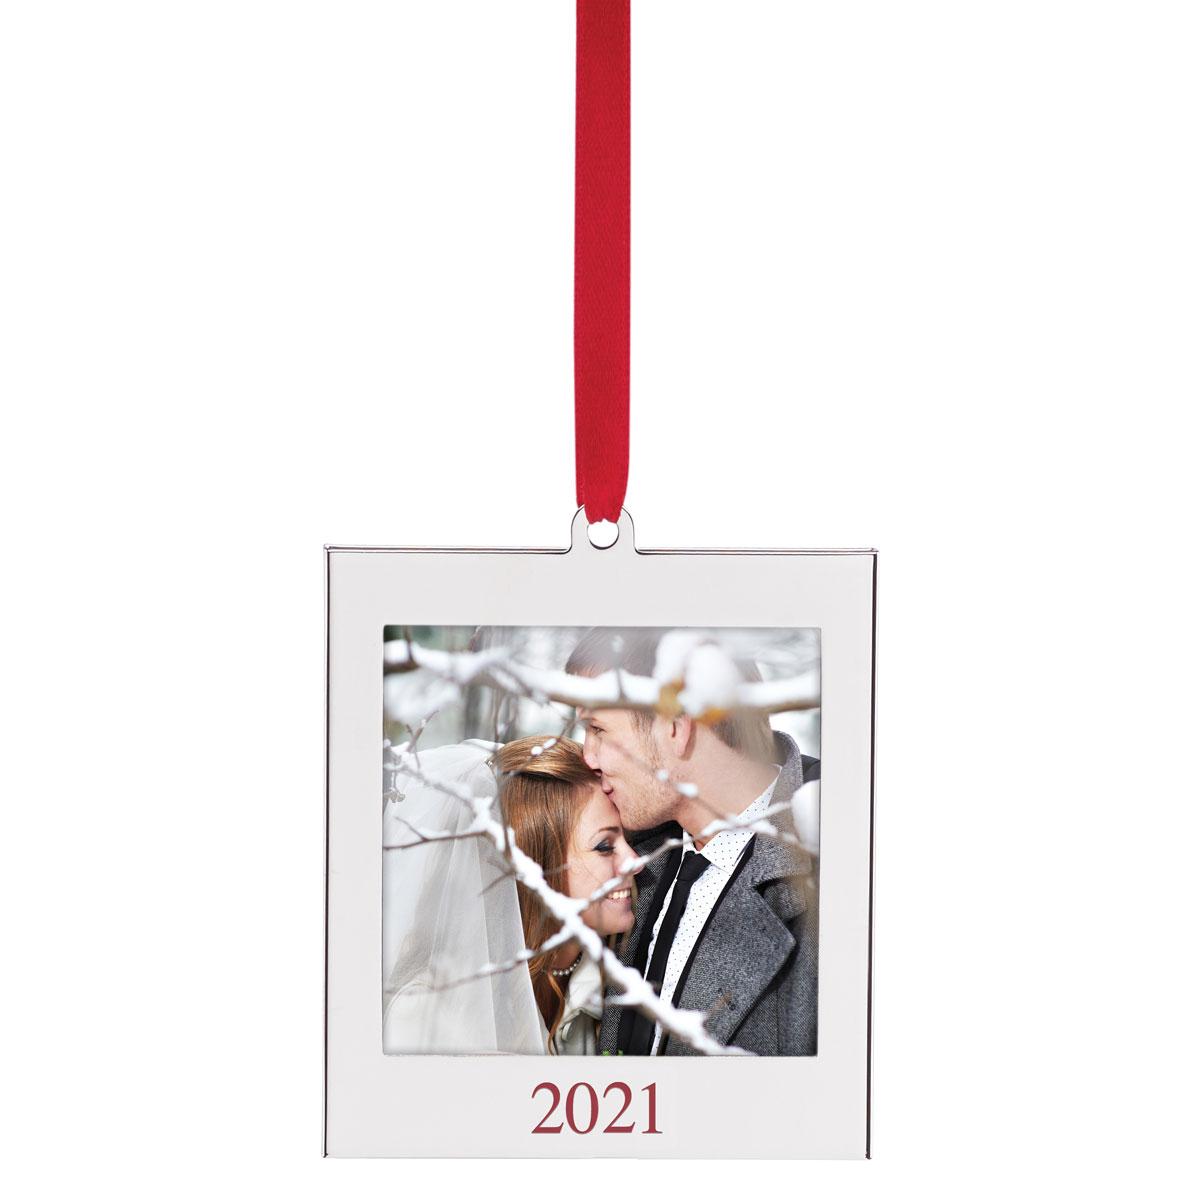 Lenox 2021 Frame Charm Metal Dated Ornament